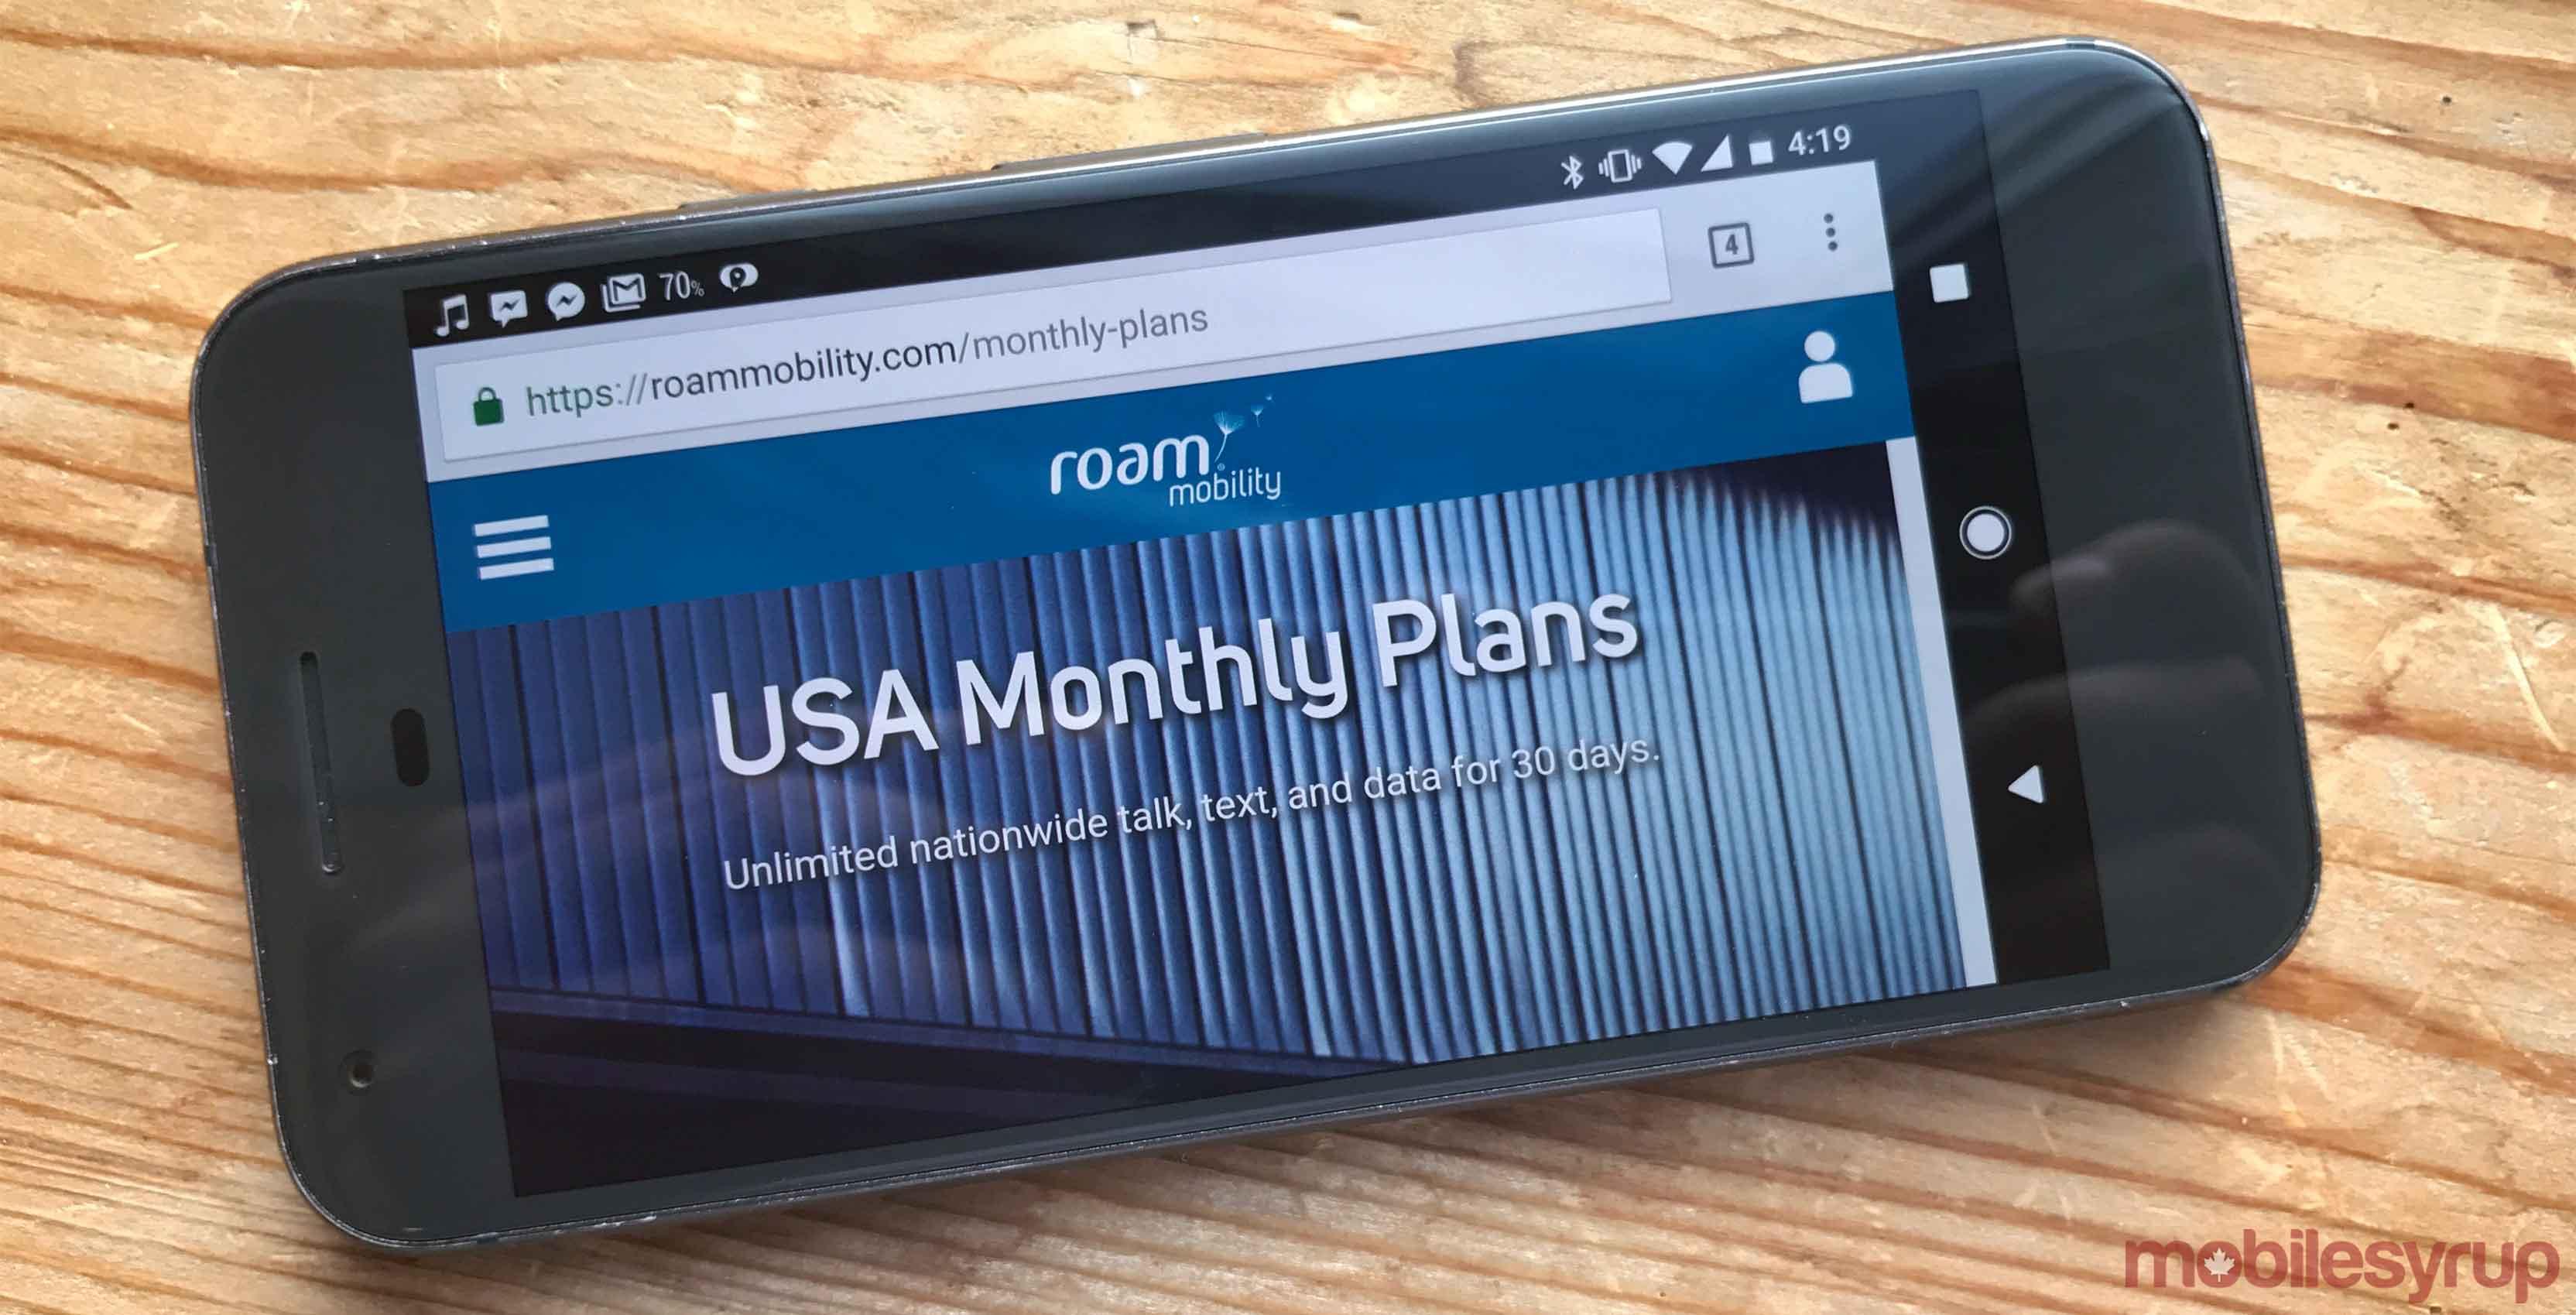 Roam Mobility website on a phone